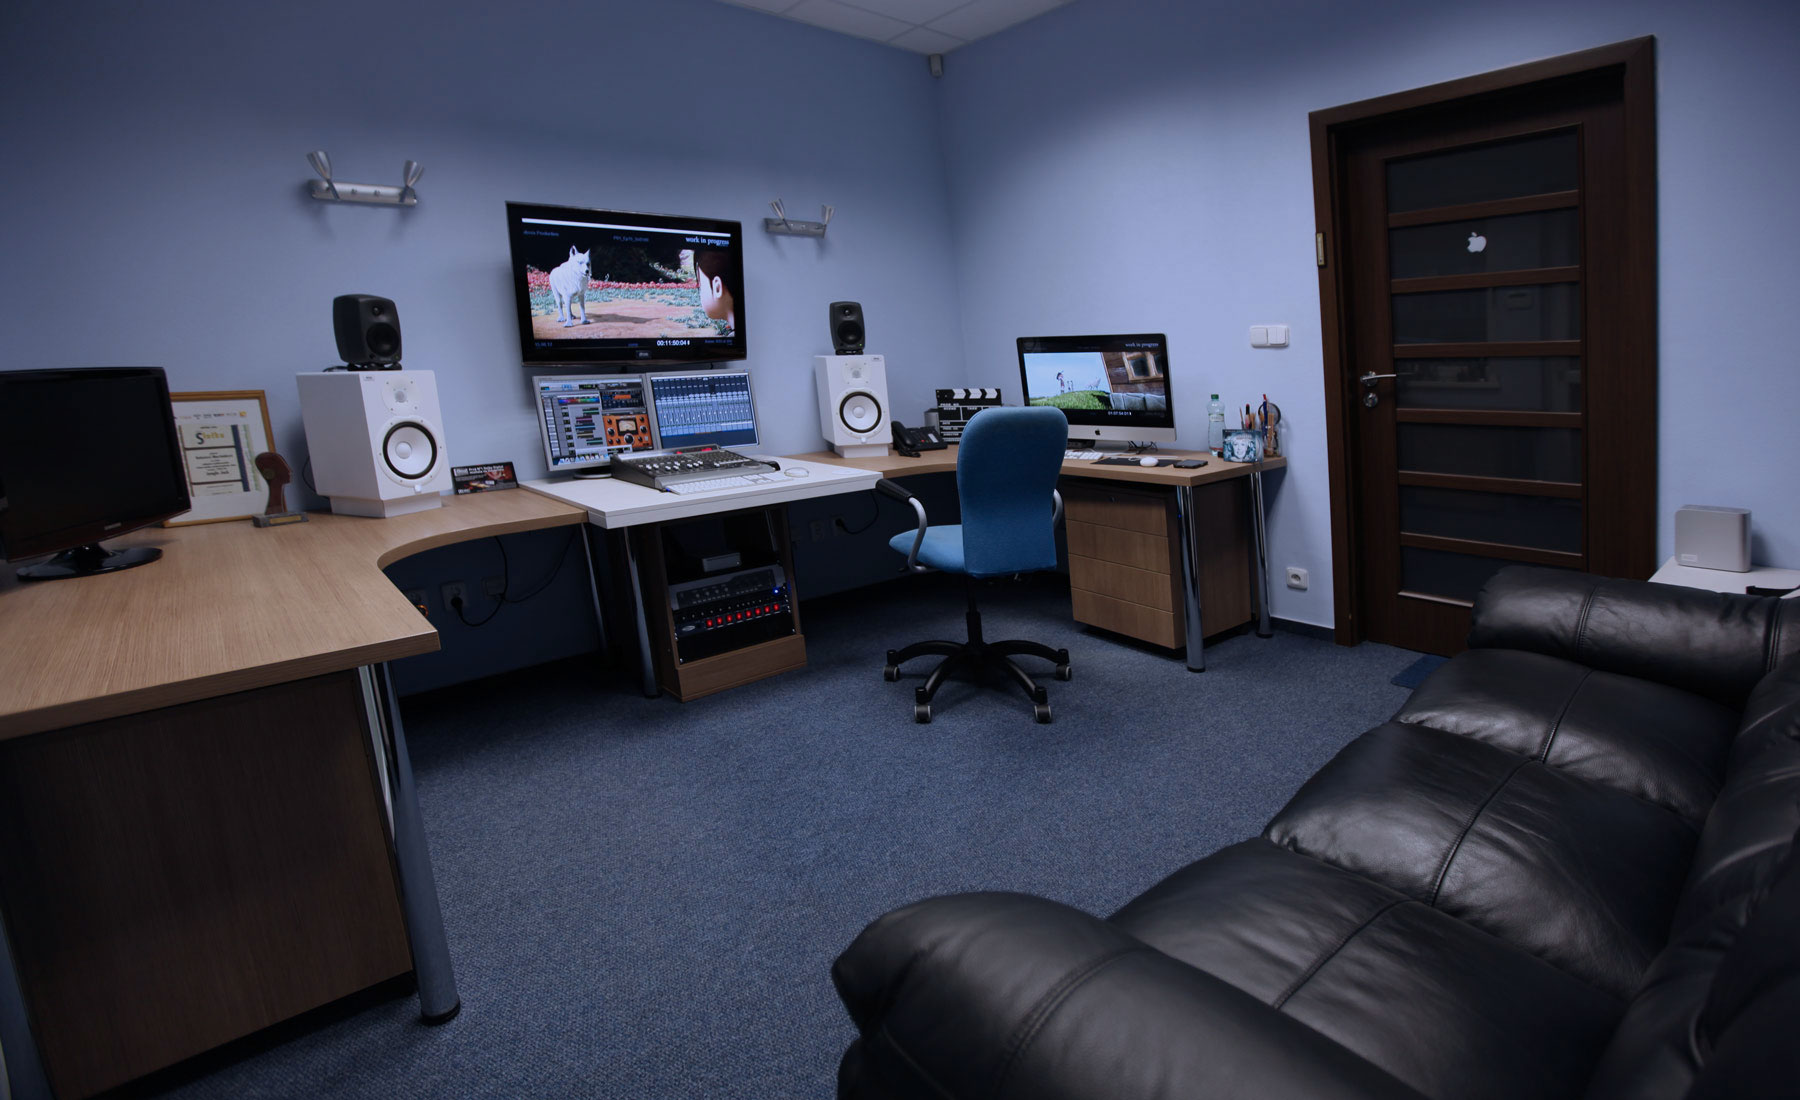 Dimas-authoringové štúdio blue DVD, Blu-ray